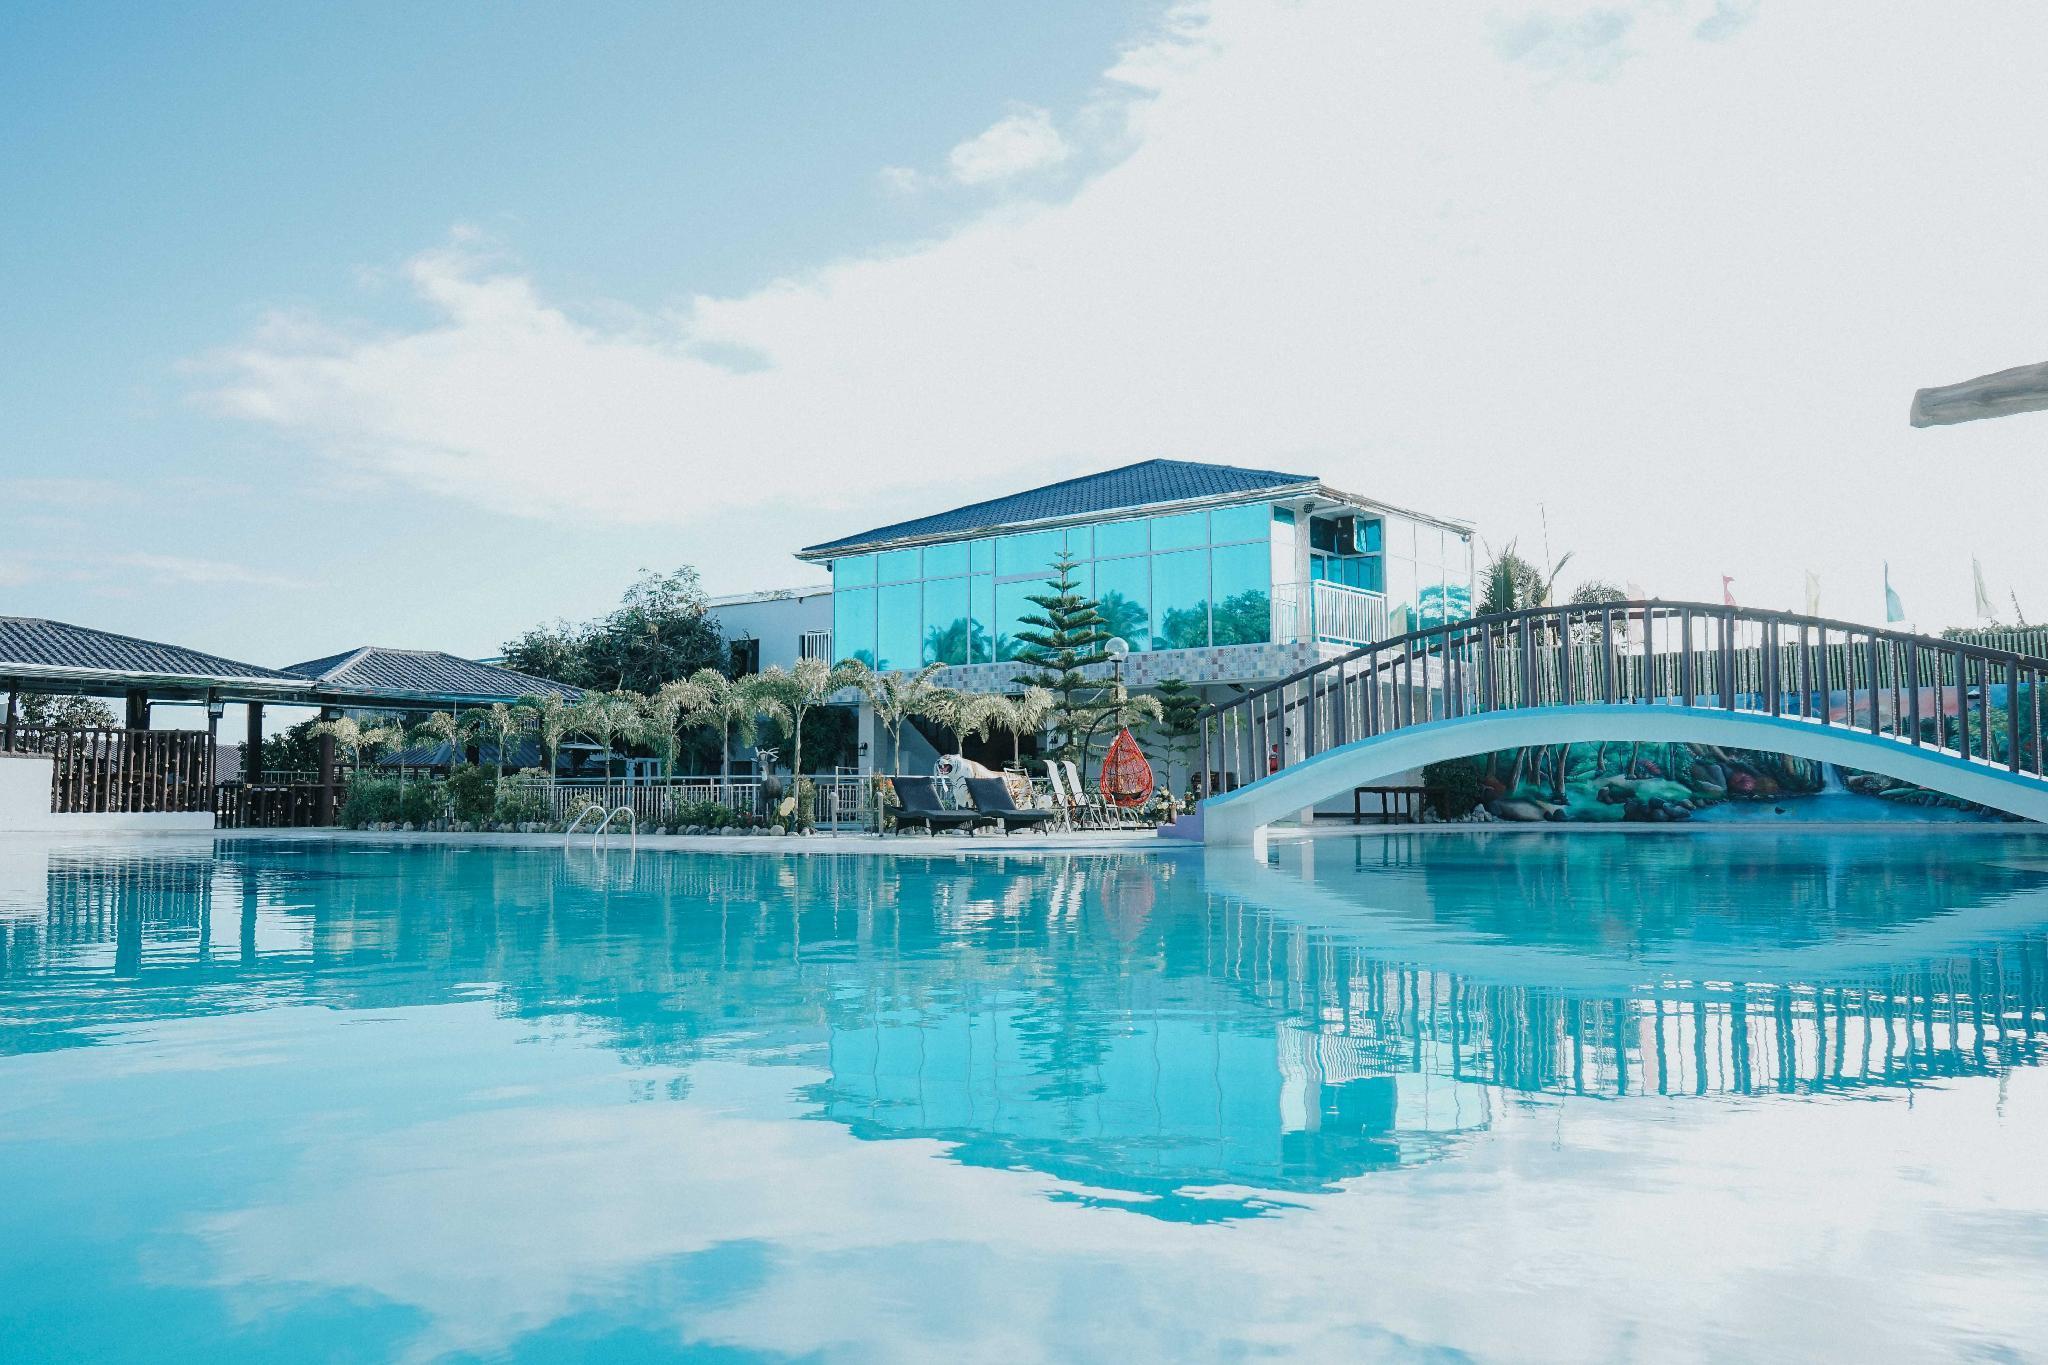 Villa Marca Hotel Resort and Events Place, Silang